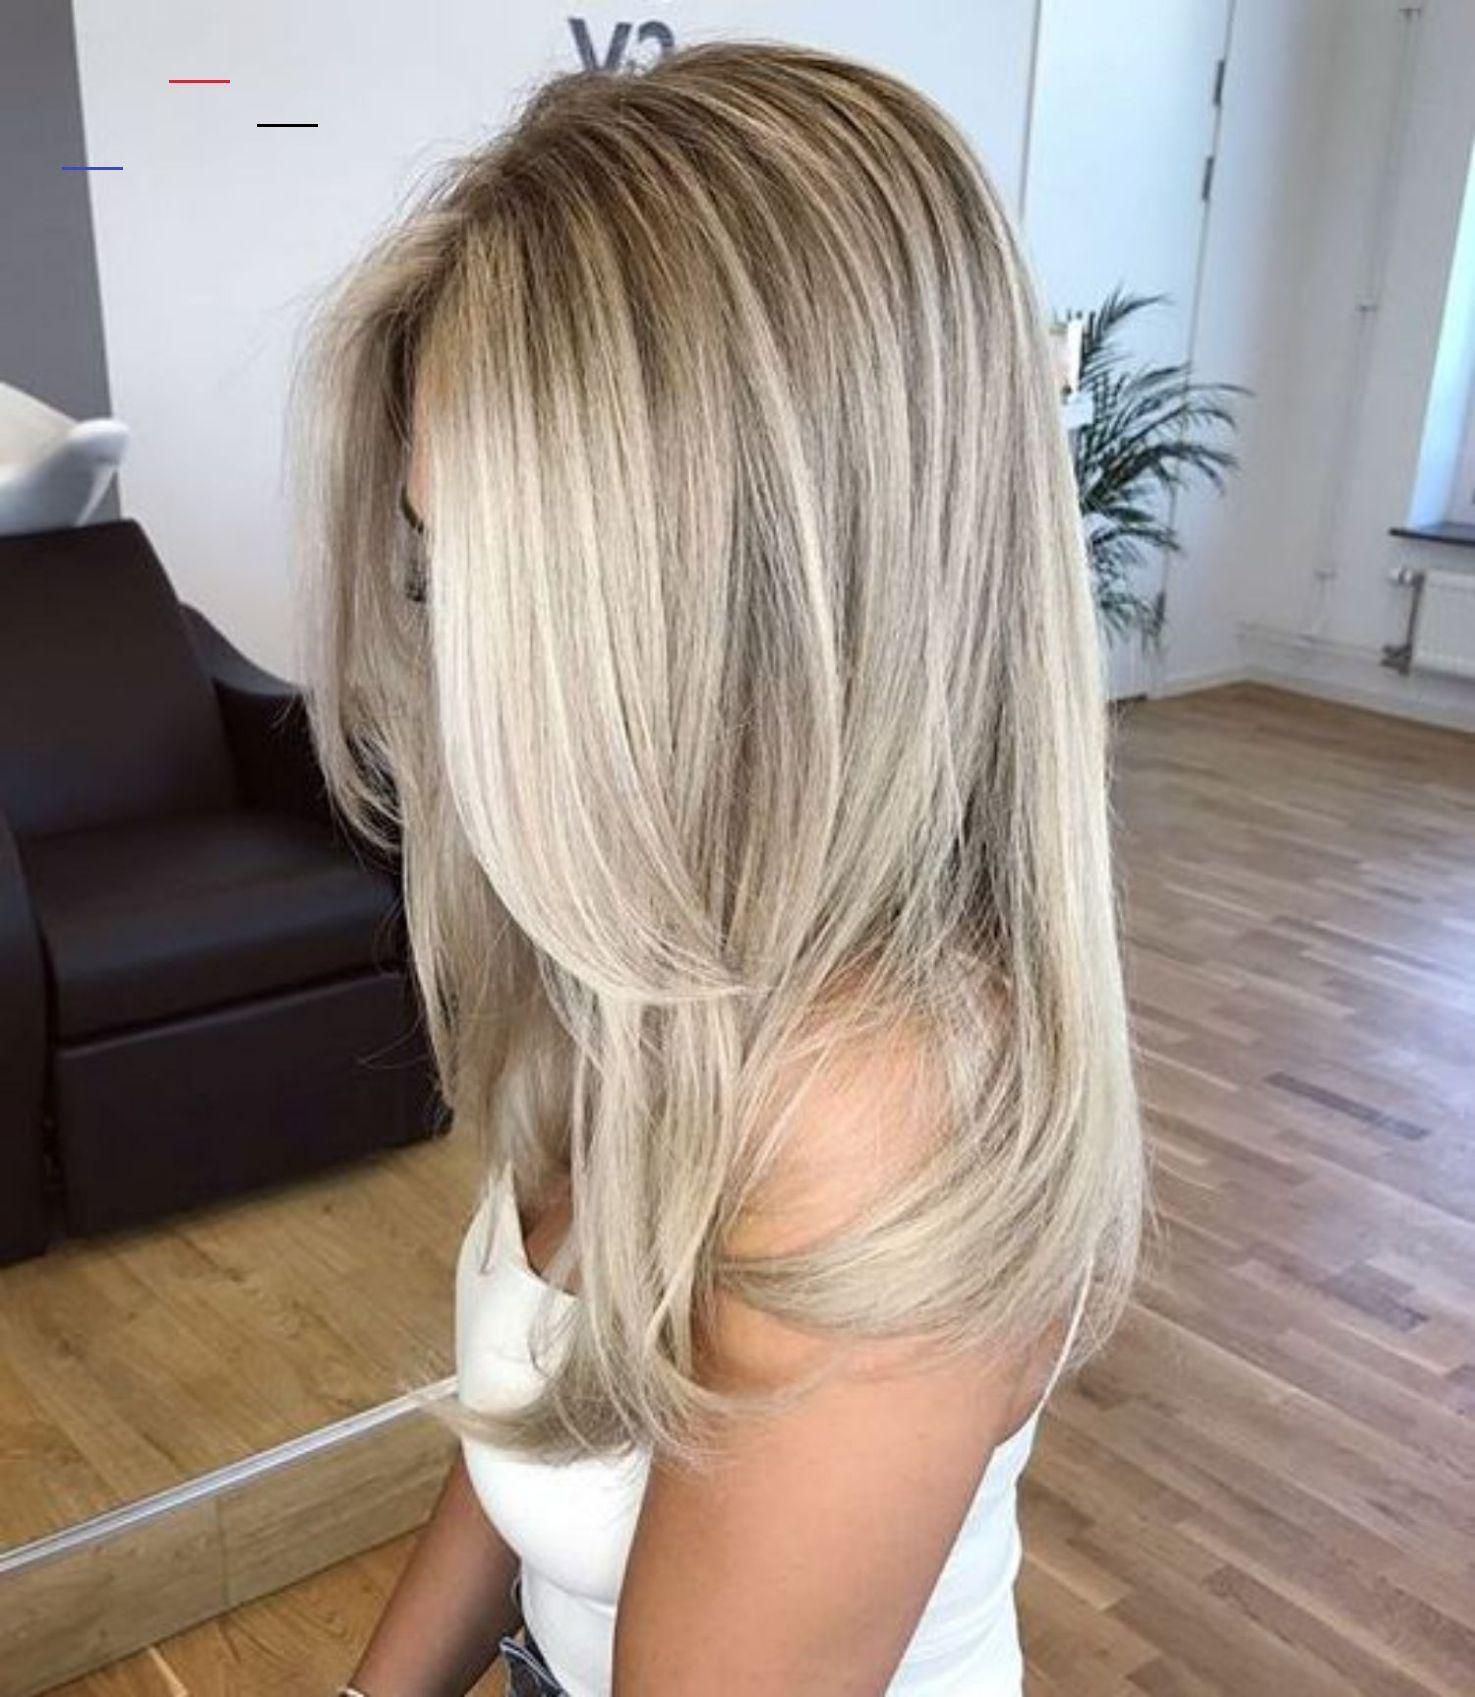 70 Devastatingly Cool Haircuts For Thin Hair Longlayeredhaircuts 54 Medium Haircut With Face Framing Pieces Smooth Em 2020 Cores De Cabelo Cabelo Longo Cabelo